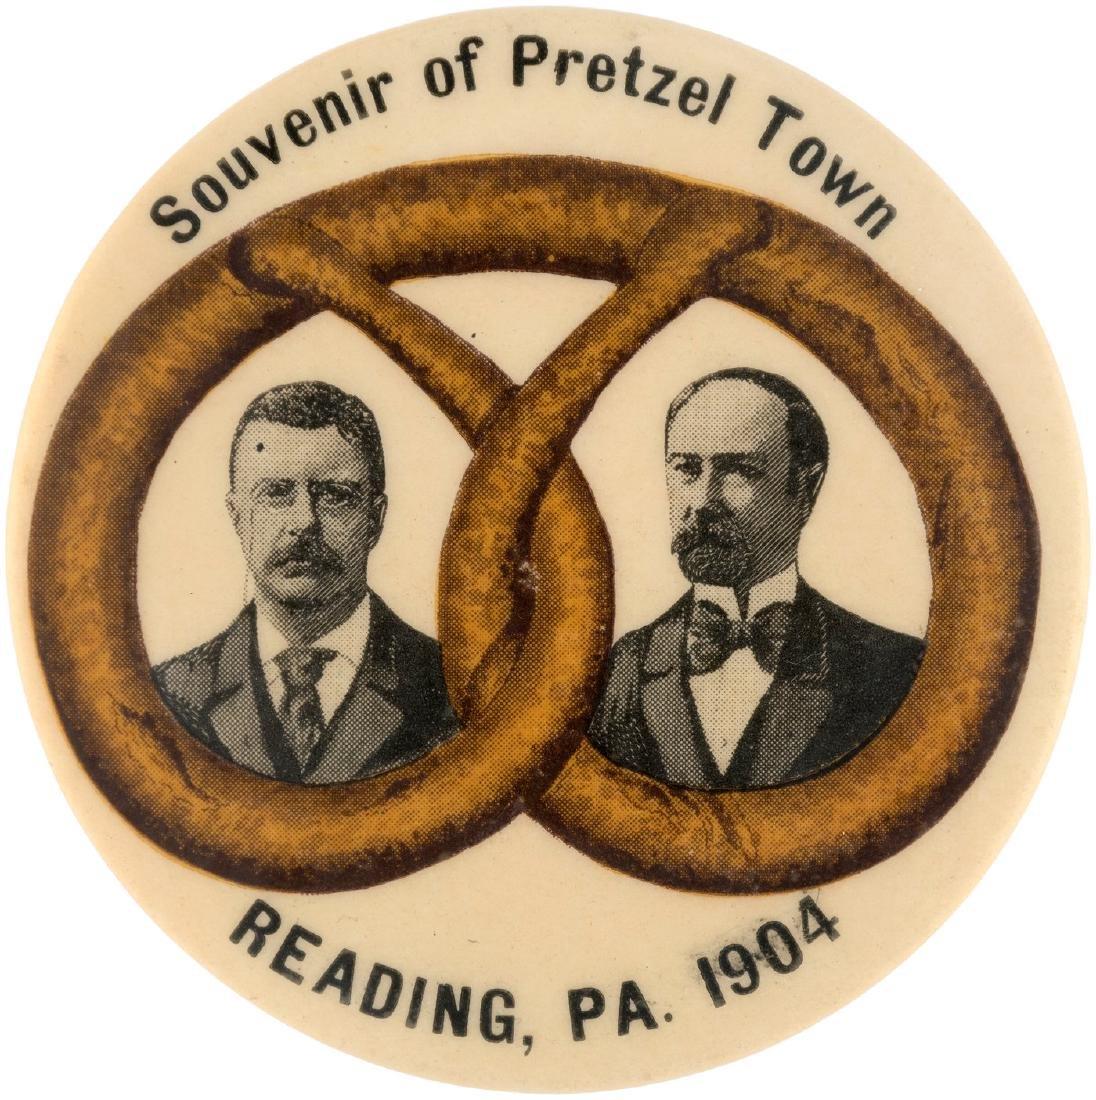 "ROOSEVELT/FAIRBANKS ""SOUVENIR OF PRETZEL TOWN READING, PA"" JUGATE BUTTON HAKE #5."